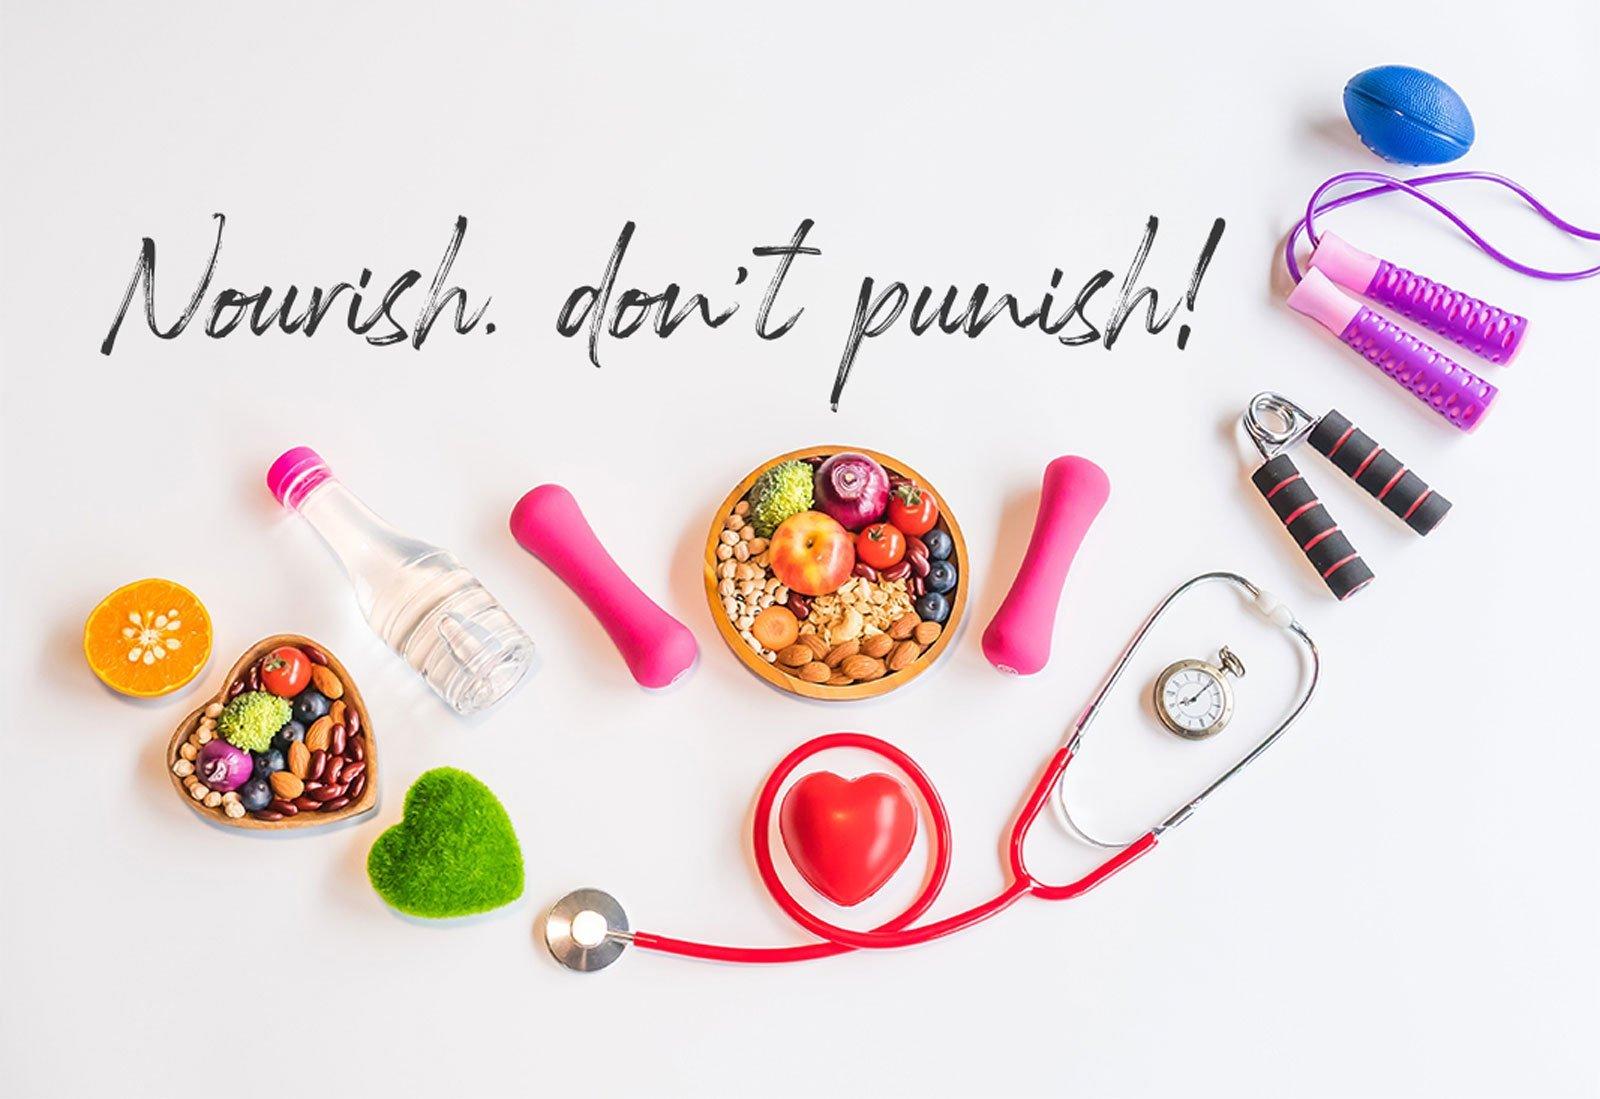 Nourish, don't punish